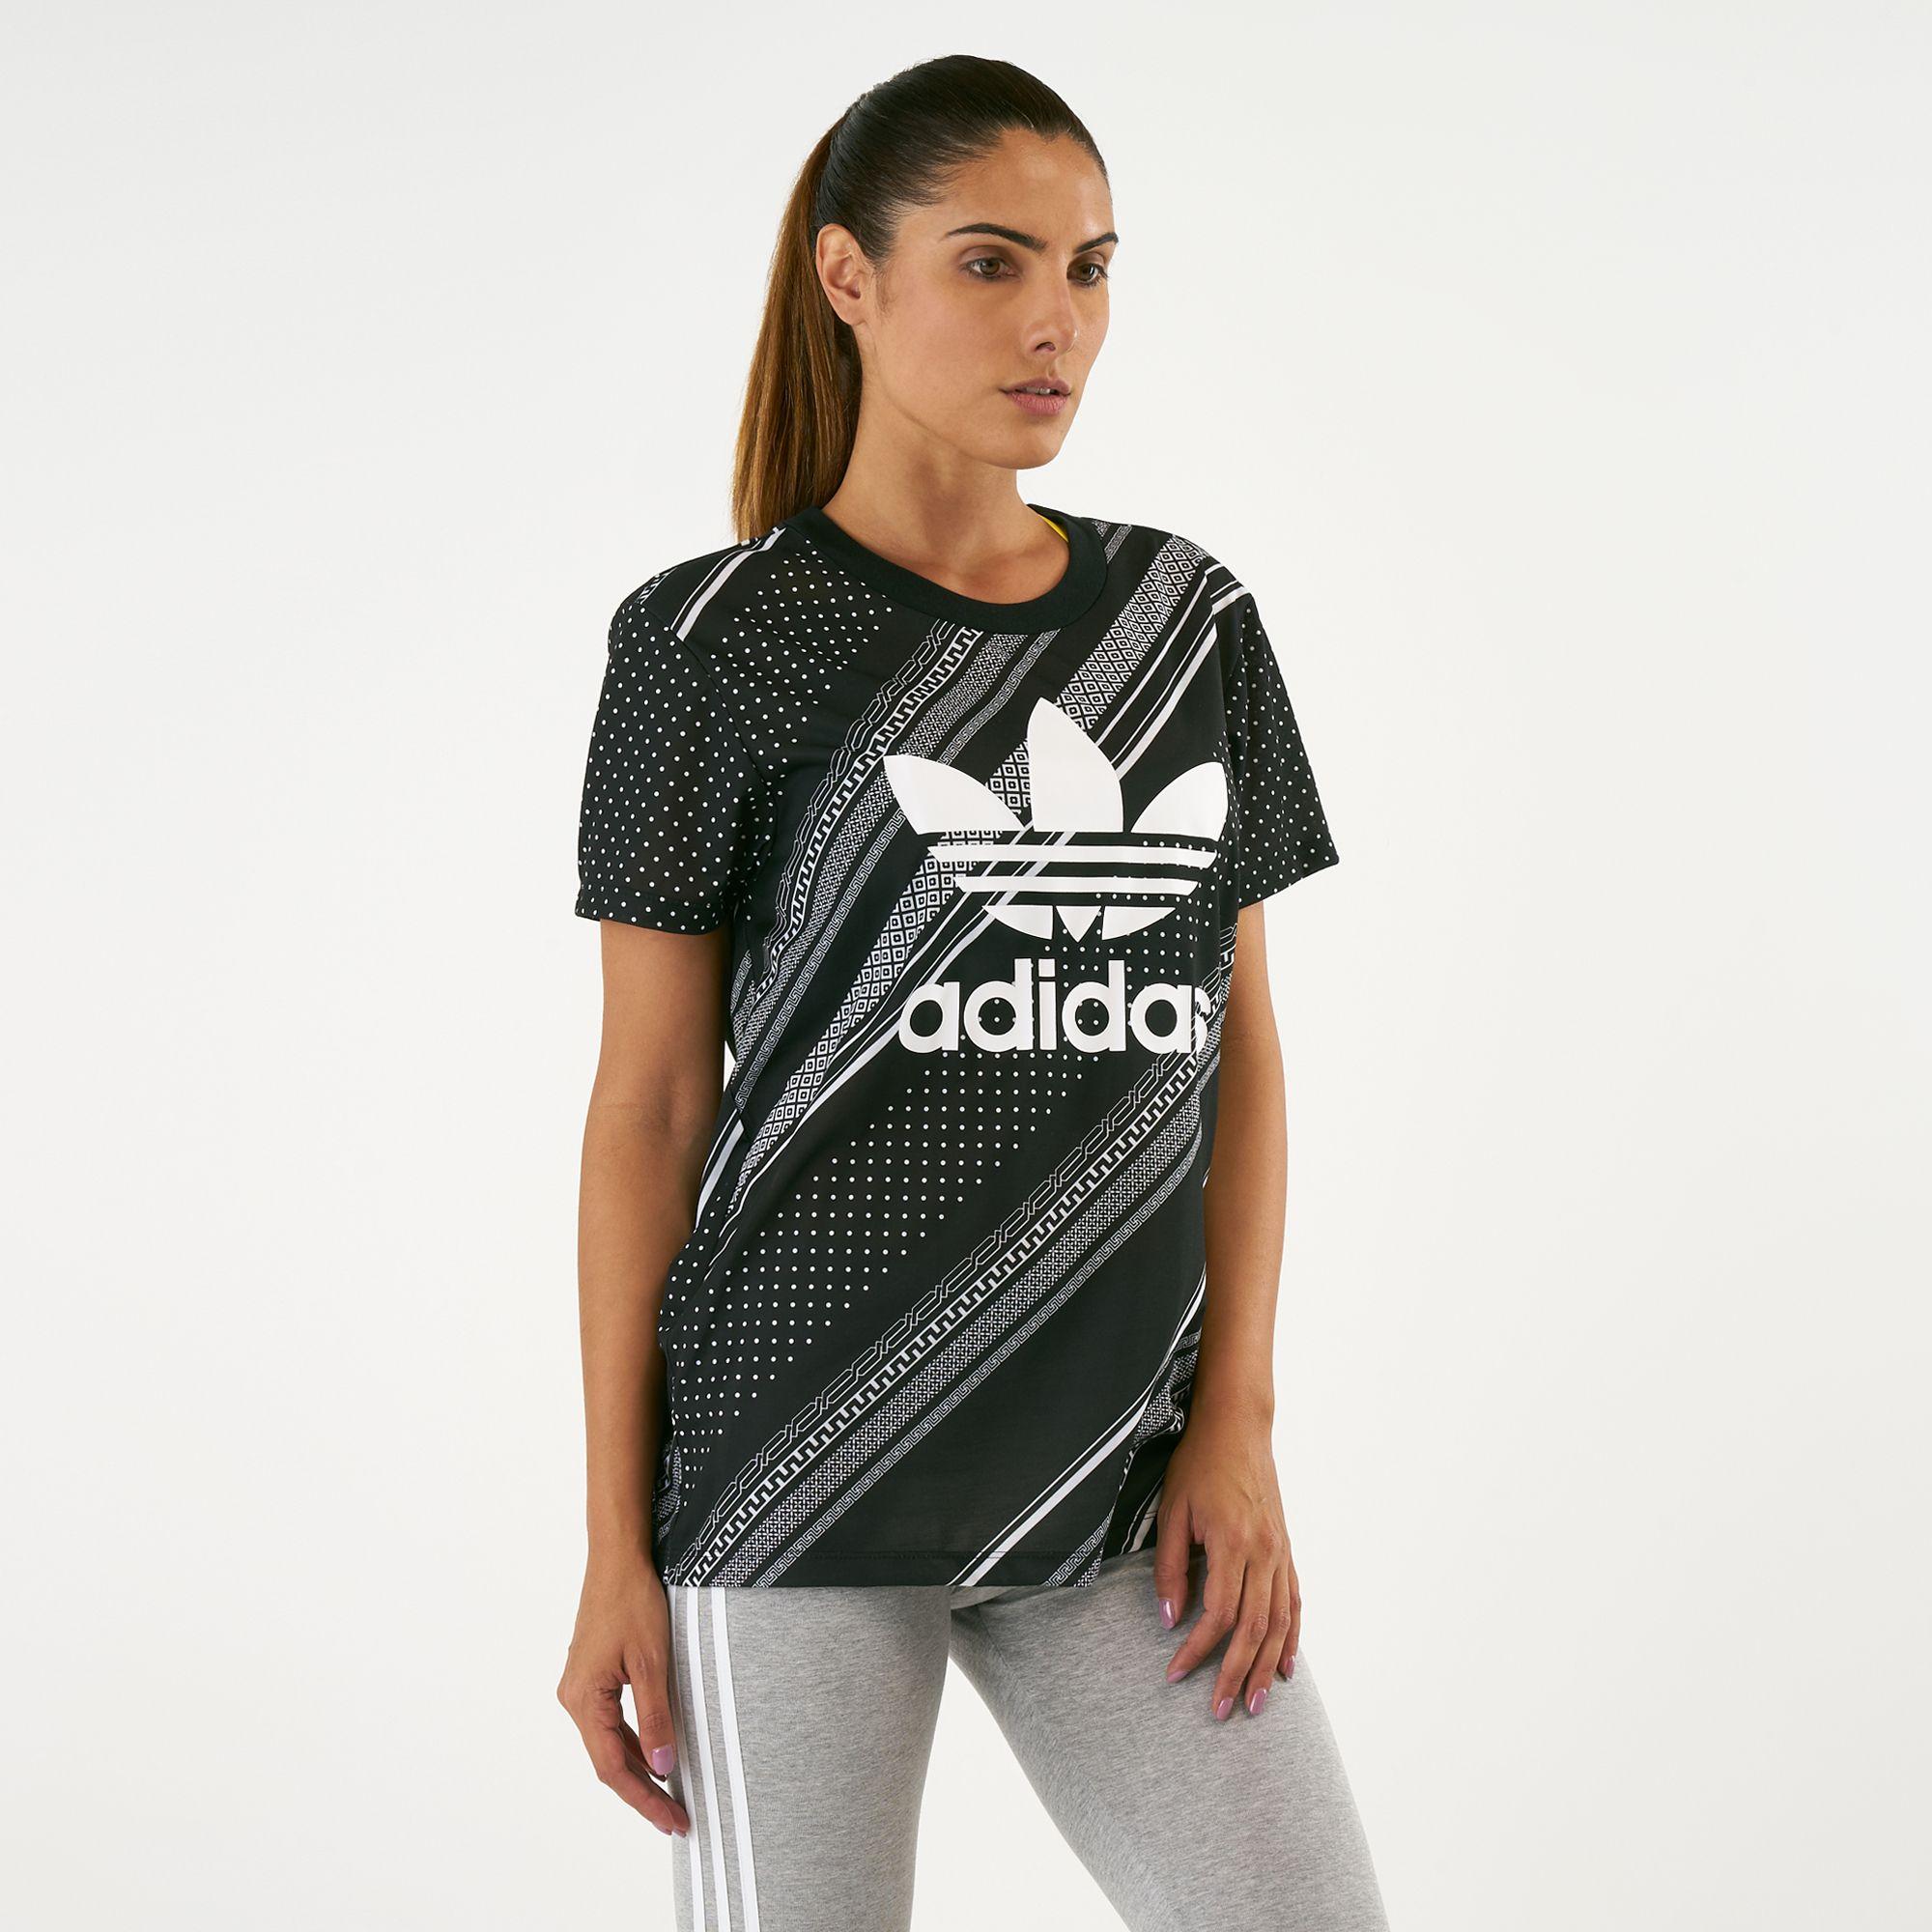 0f9bfb0f adidas Originals Women's Boyfriend Trefoil T-Shirt | T-Shirts | Tops ...